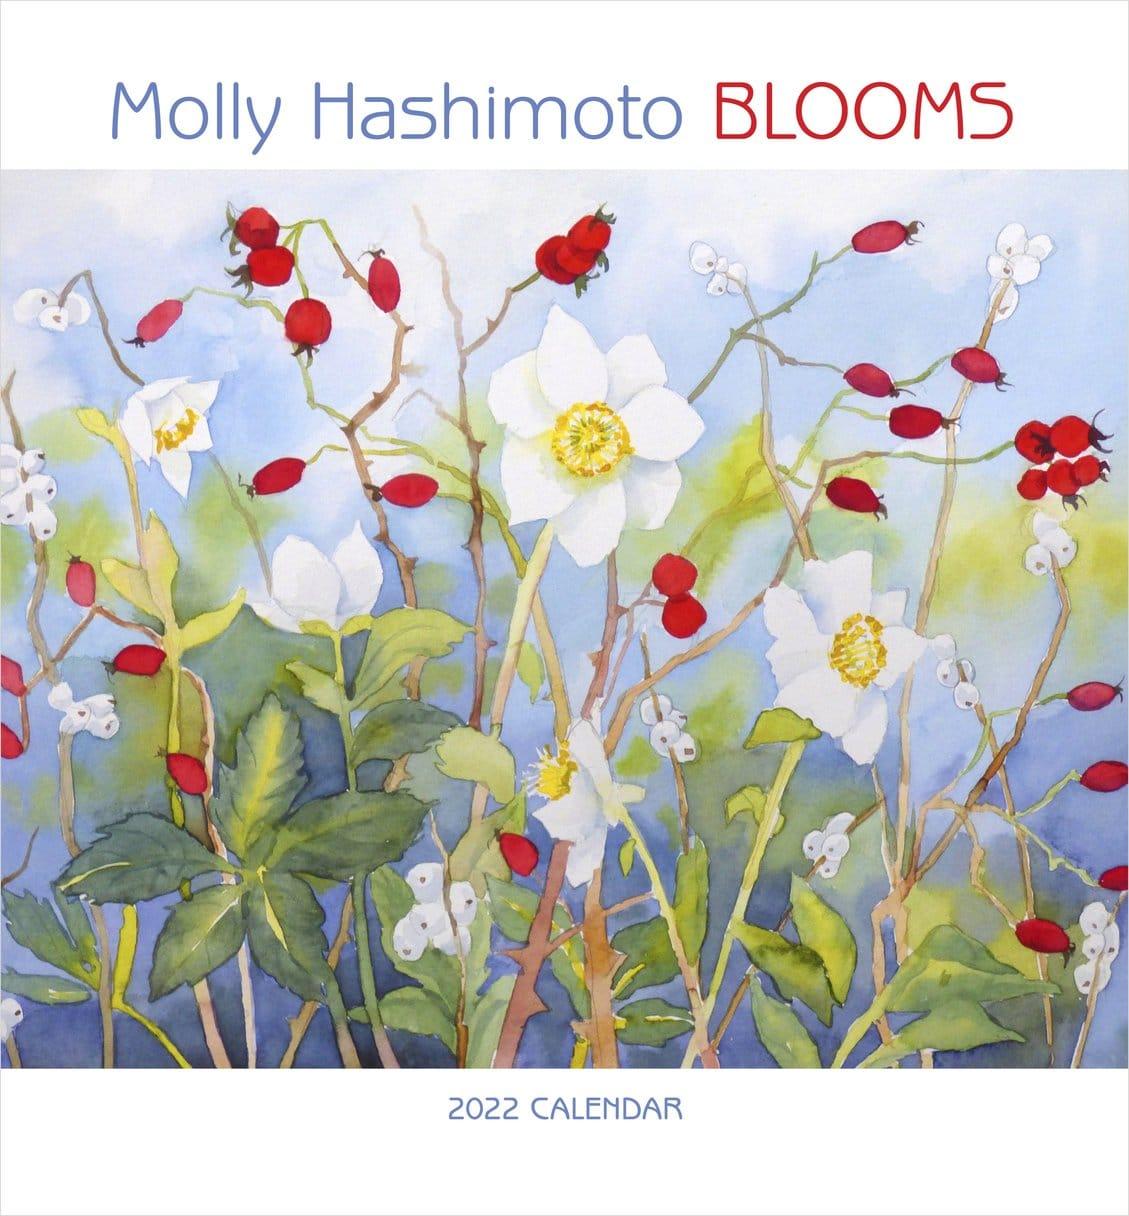 Hashimoto Blooms 2022 Calendar